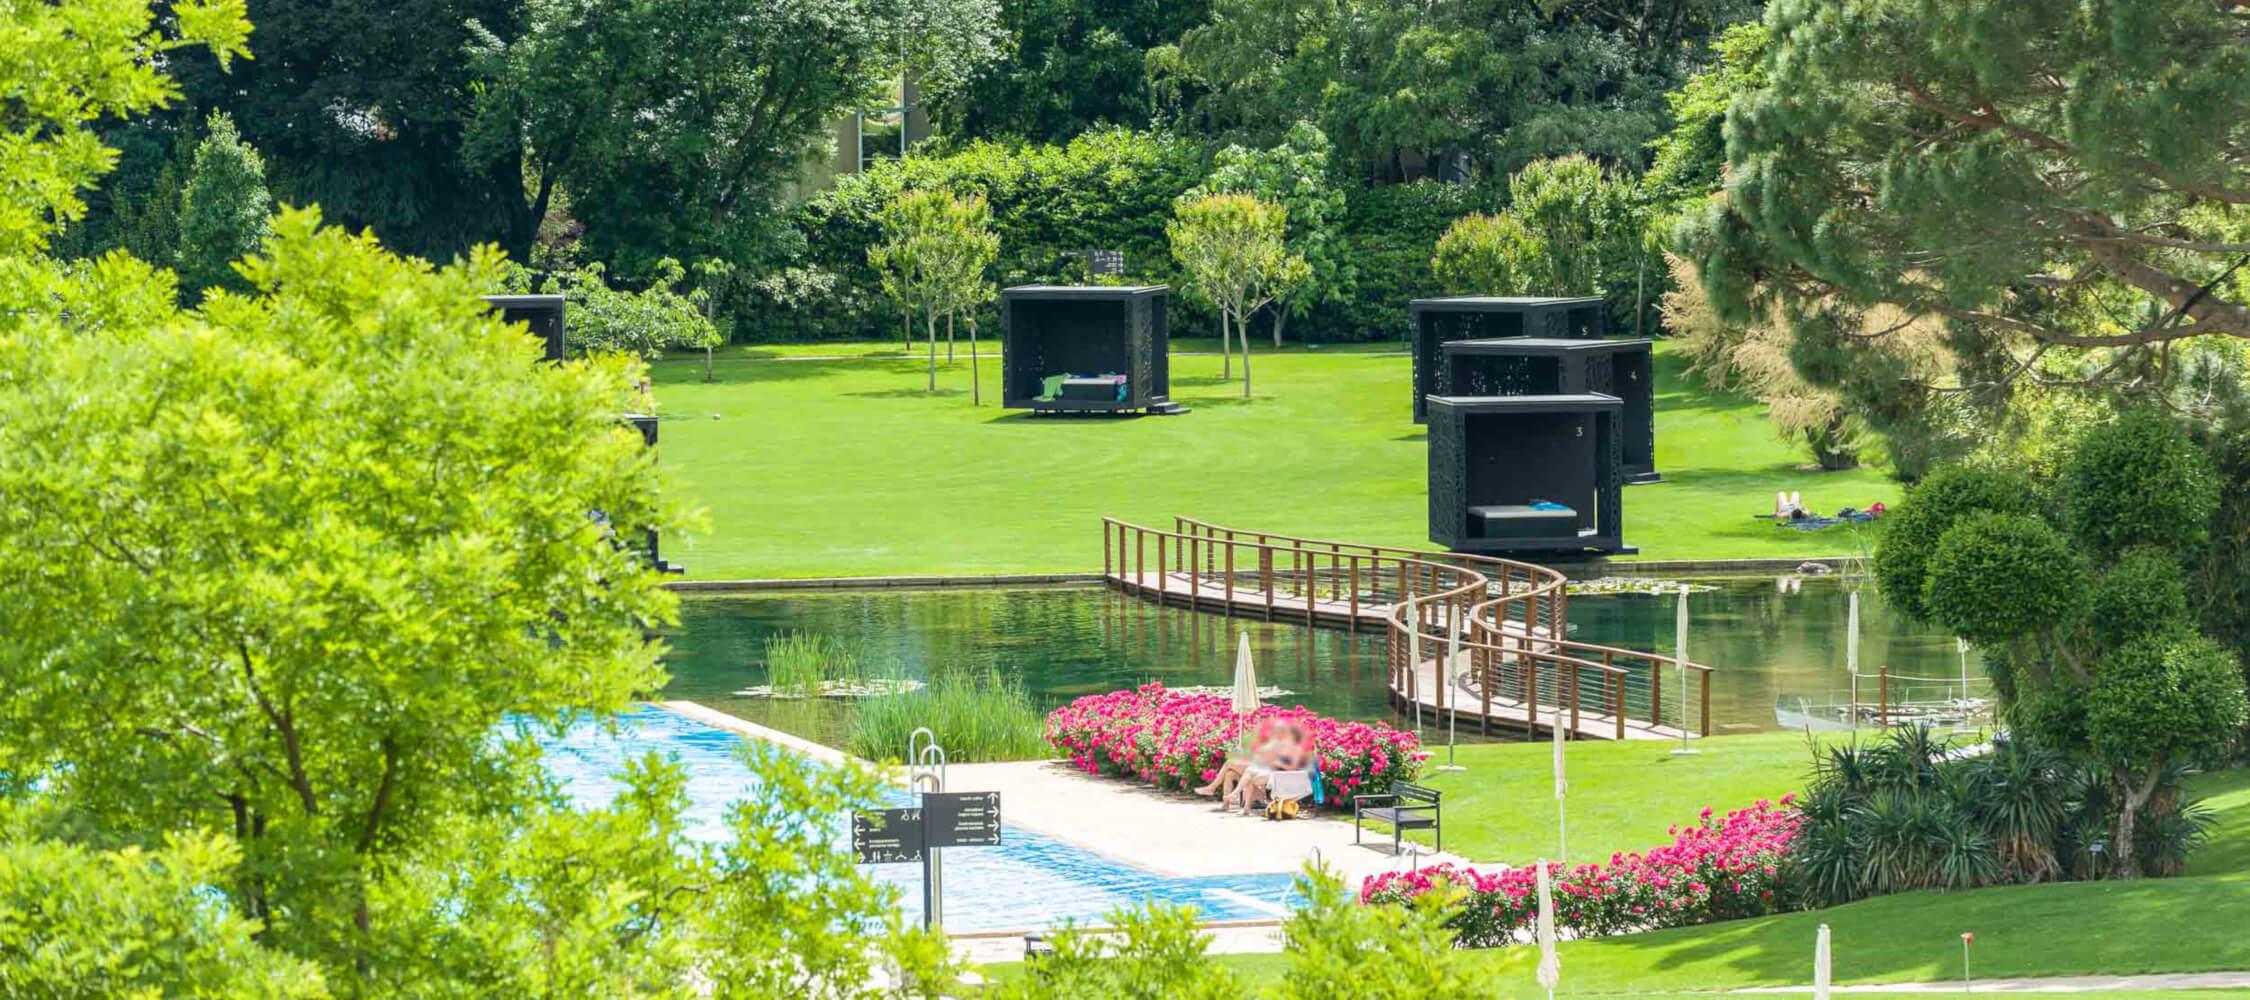 Italien-Trentino_Suedtirol_Alto_Adige_Merano_Meran_Therme_Pool_Aussen_Park_Relax_Lounges_48_AlfredTschager_2250x1000